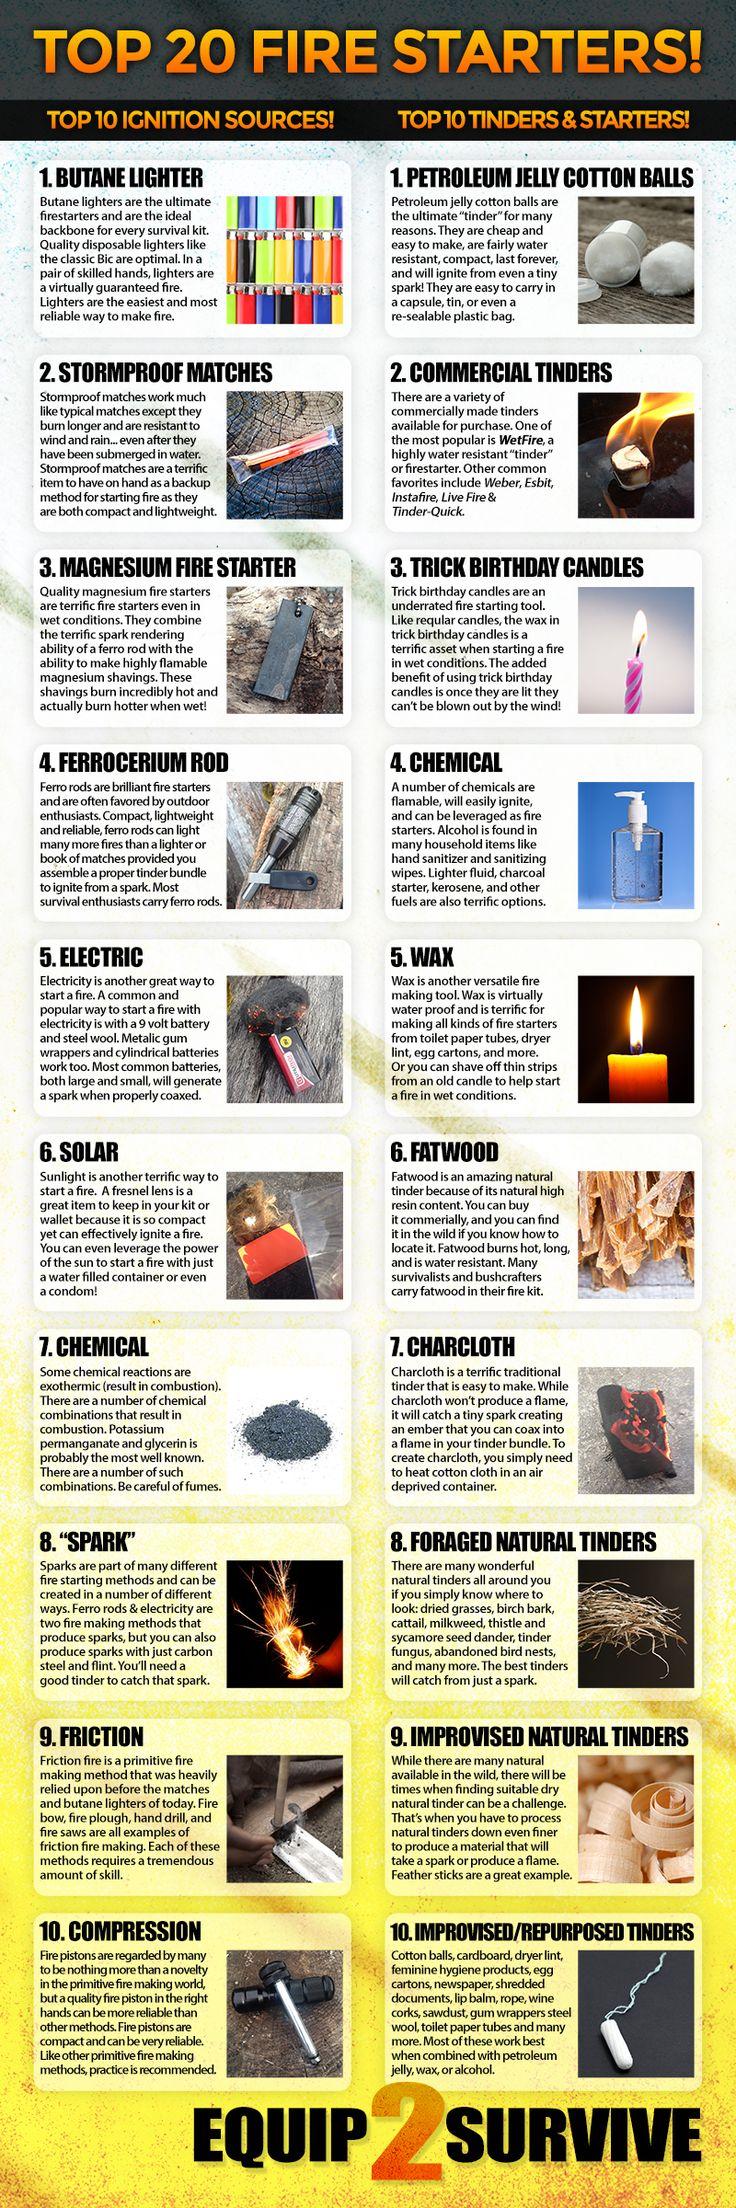 Top 20 firestarters